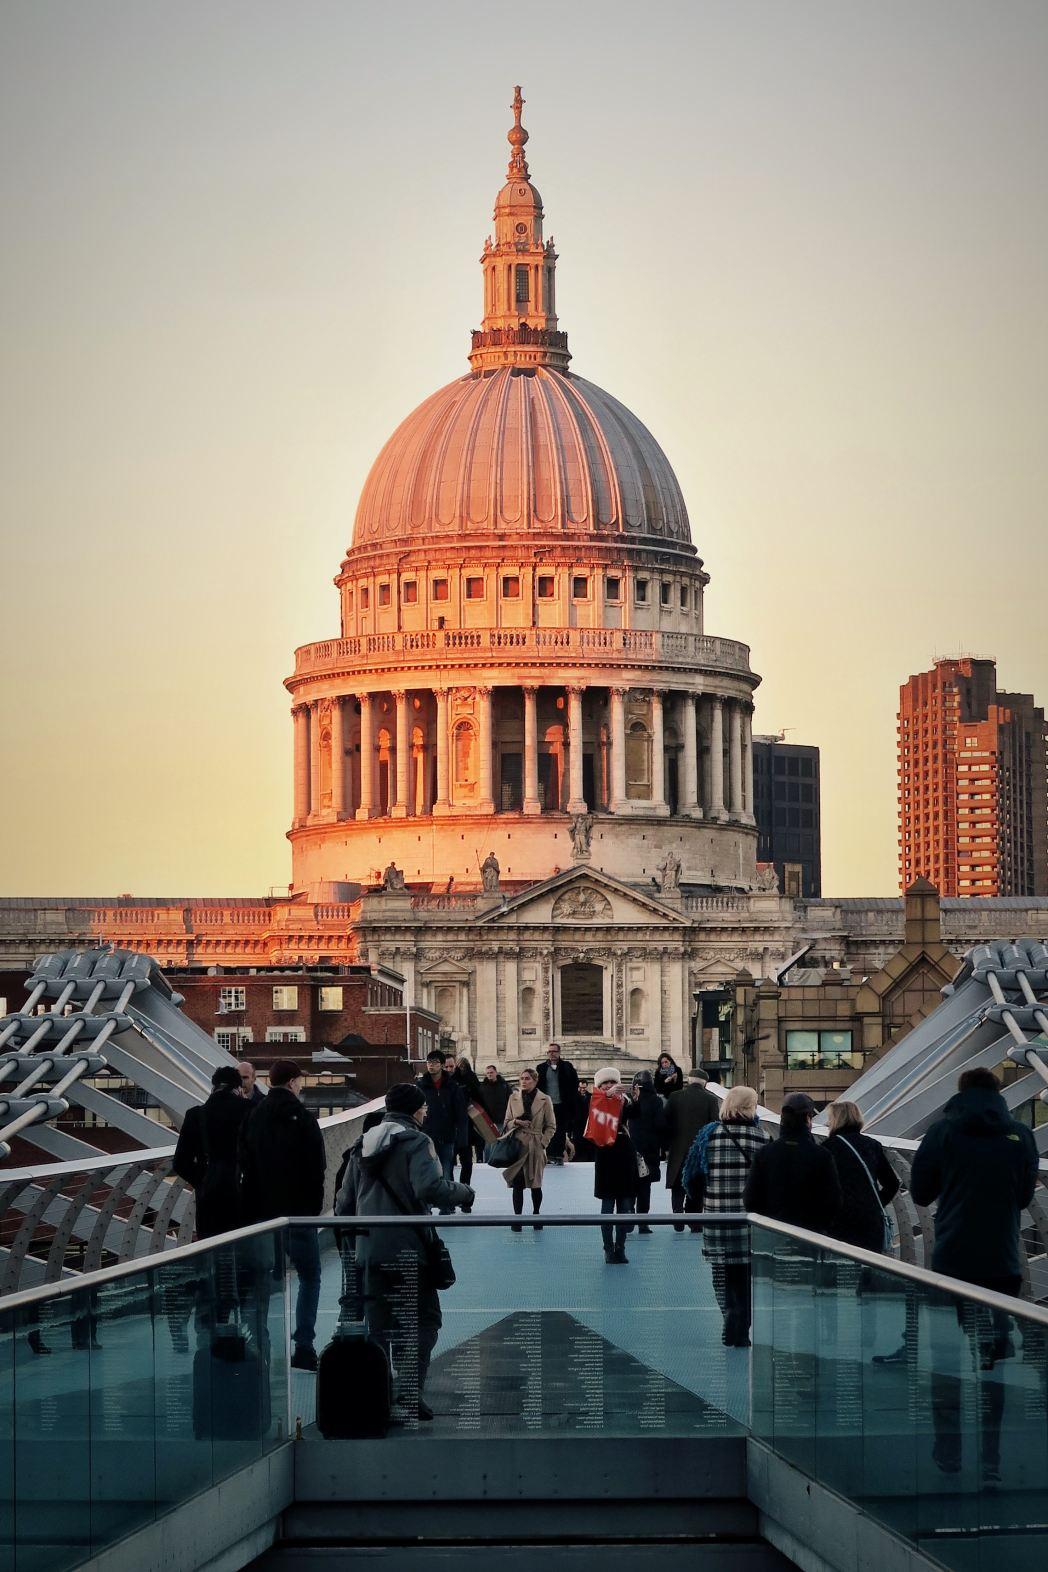 I 20 tramonti più belli d'Europa: Londra